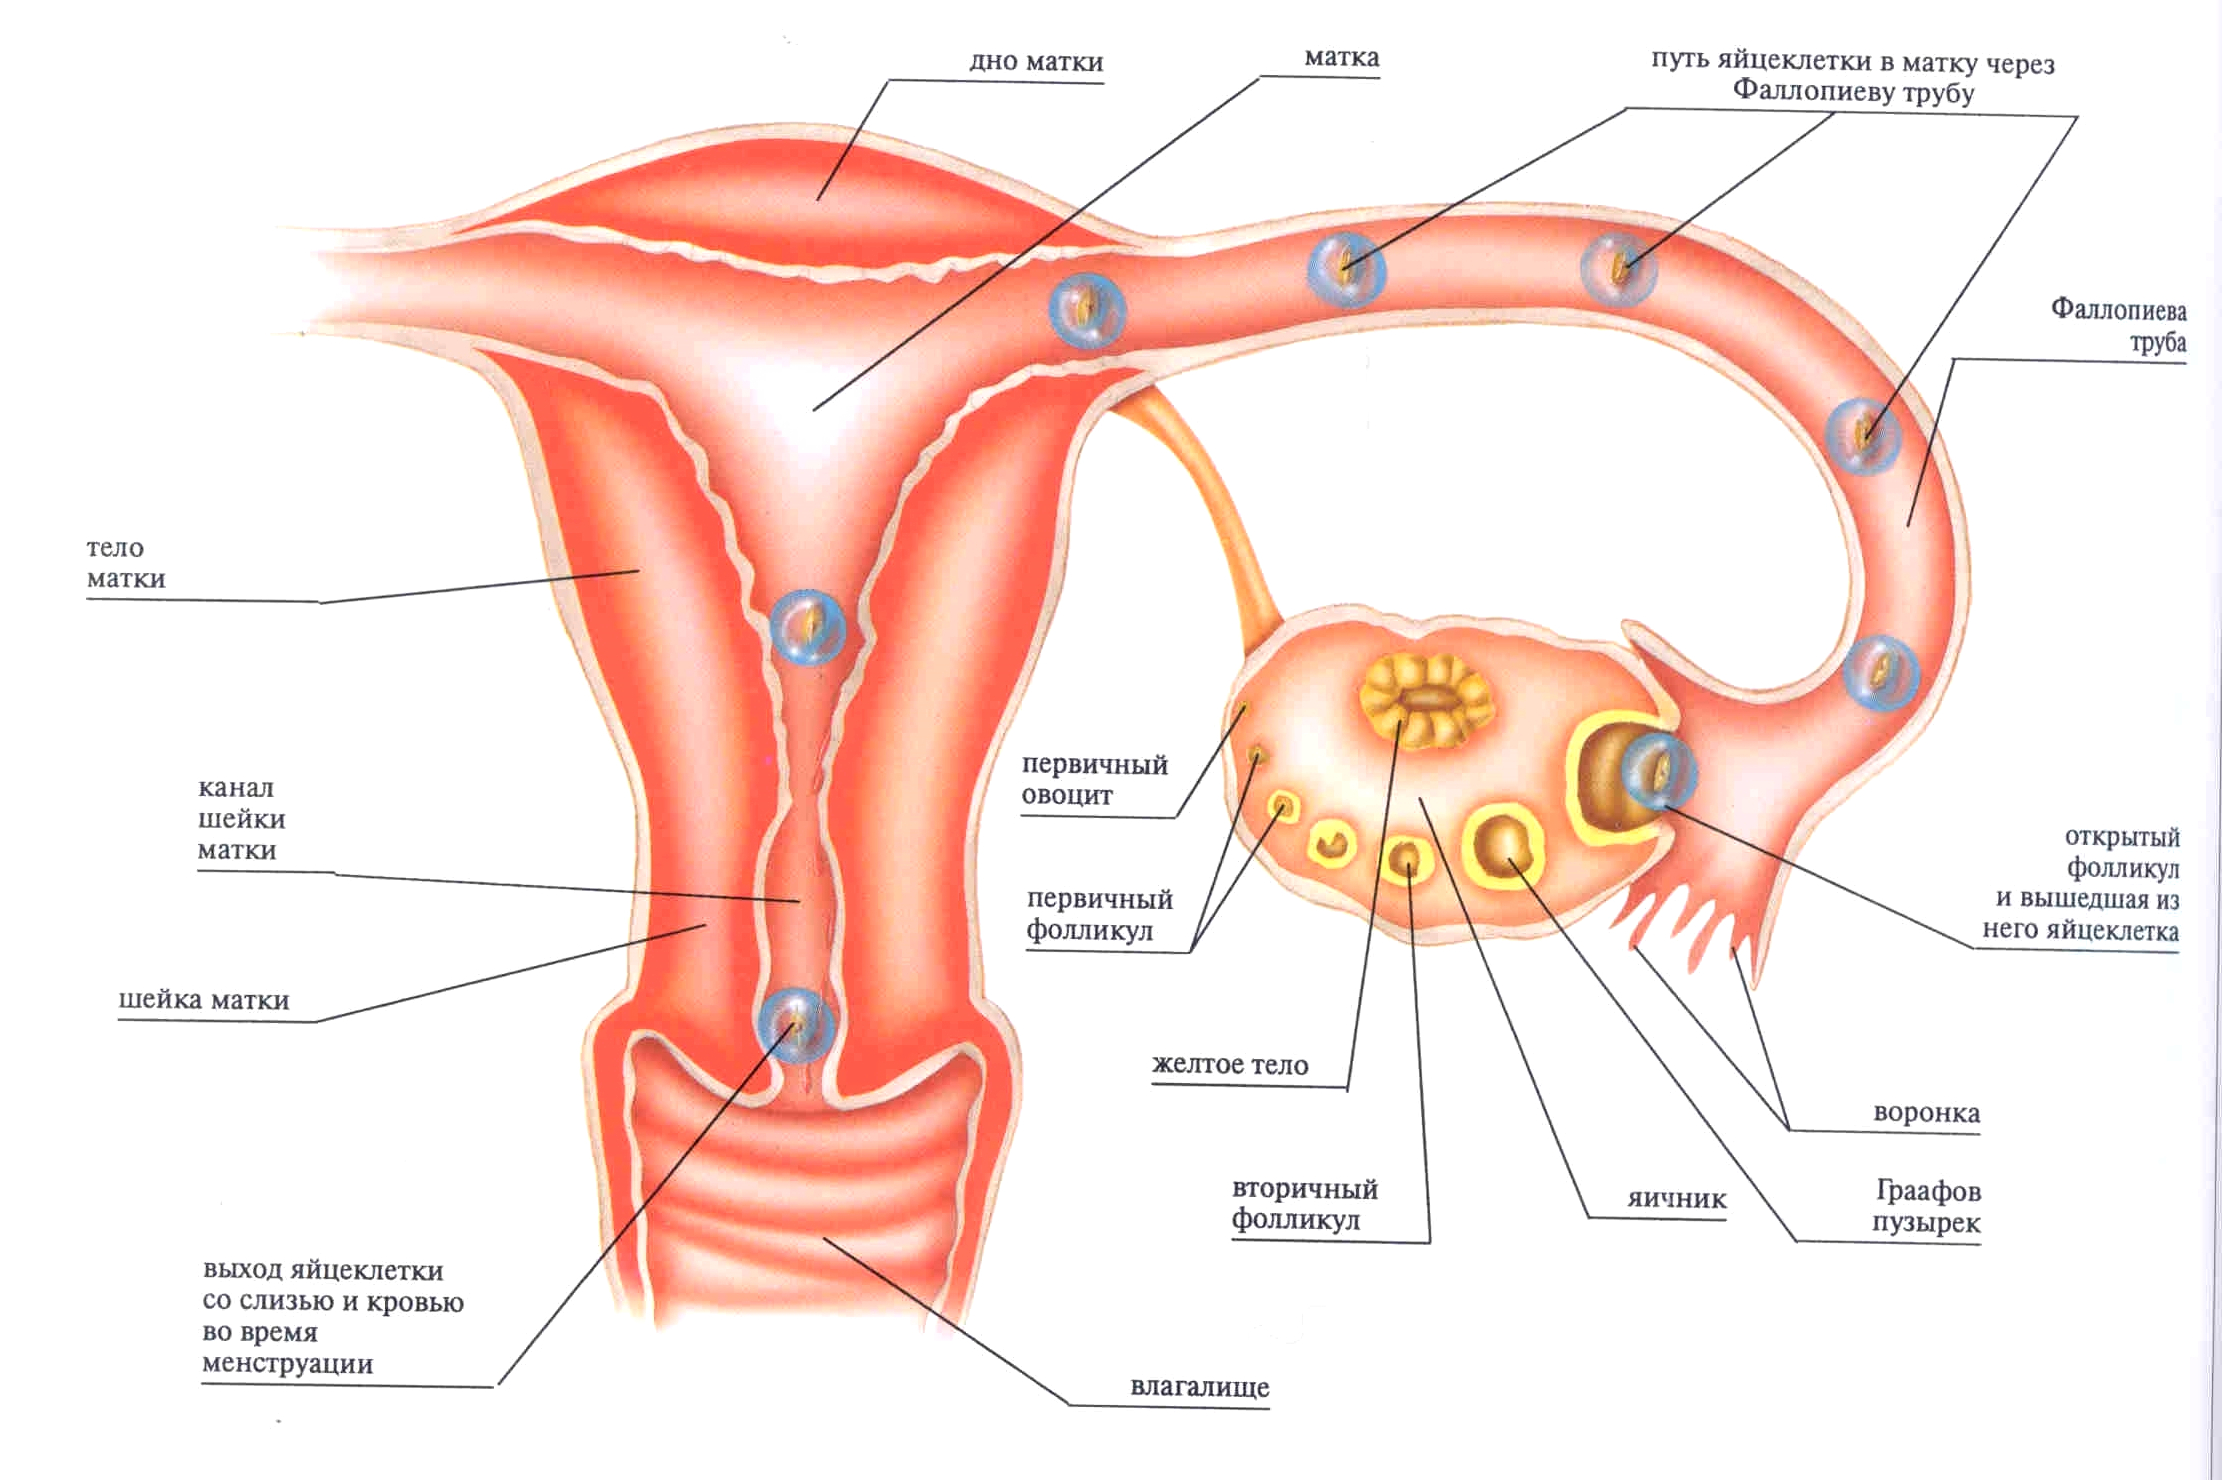 Фото матки яйцеклетки сперматозоида